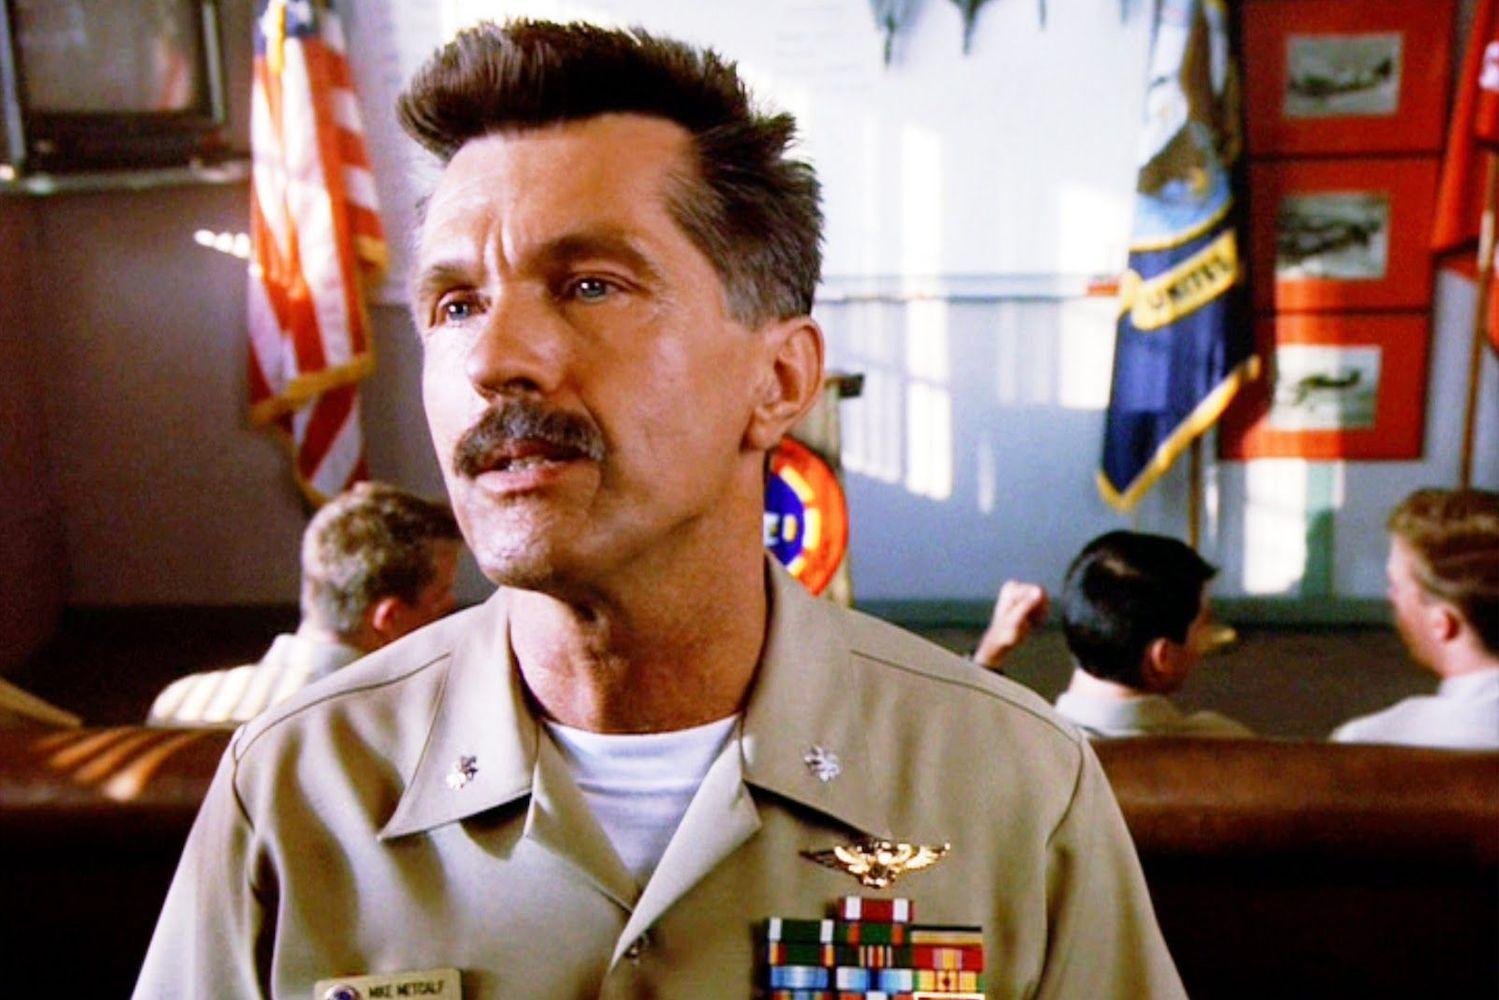 'Top Gun' Star Tom Skerritt Teases the Return of 'Viper' in Upcoming Sequel